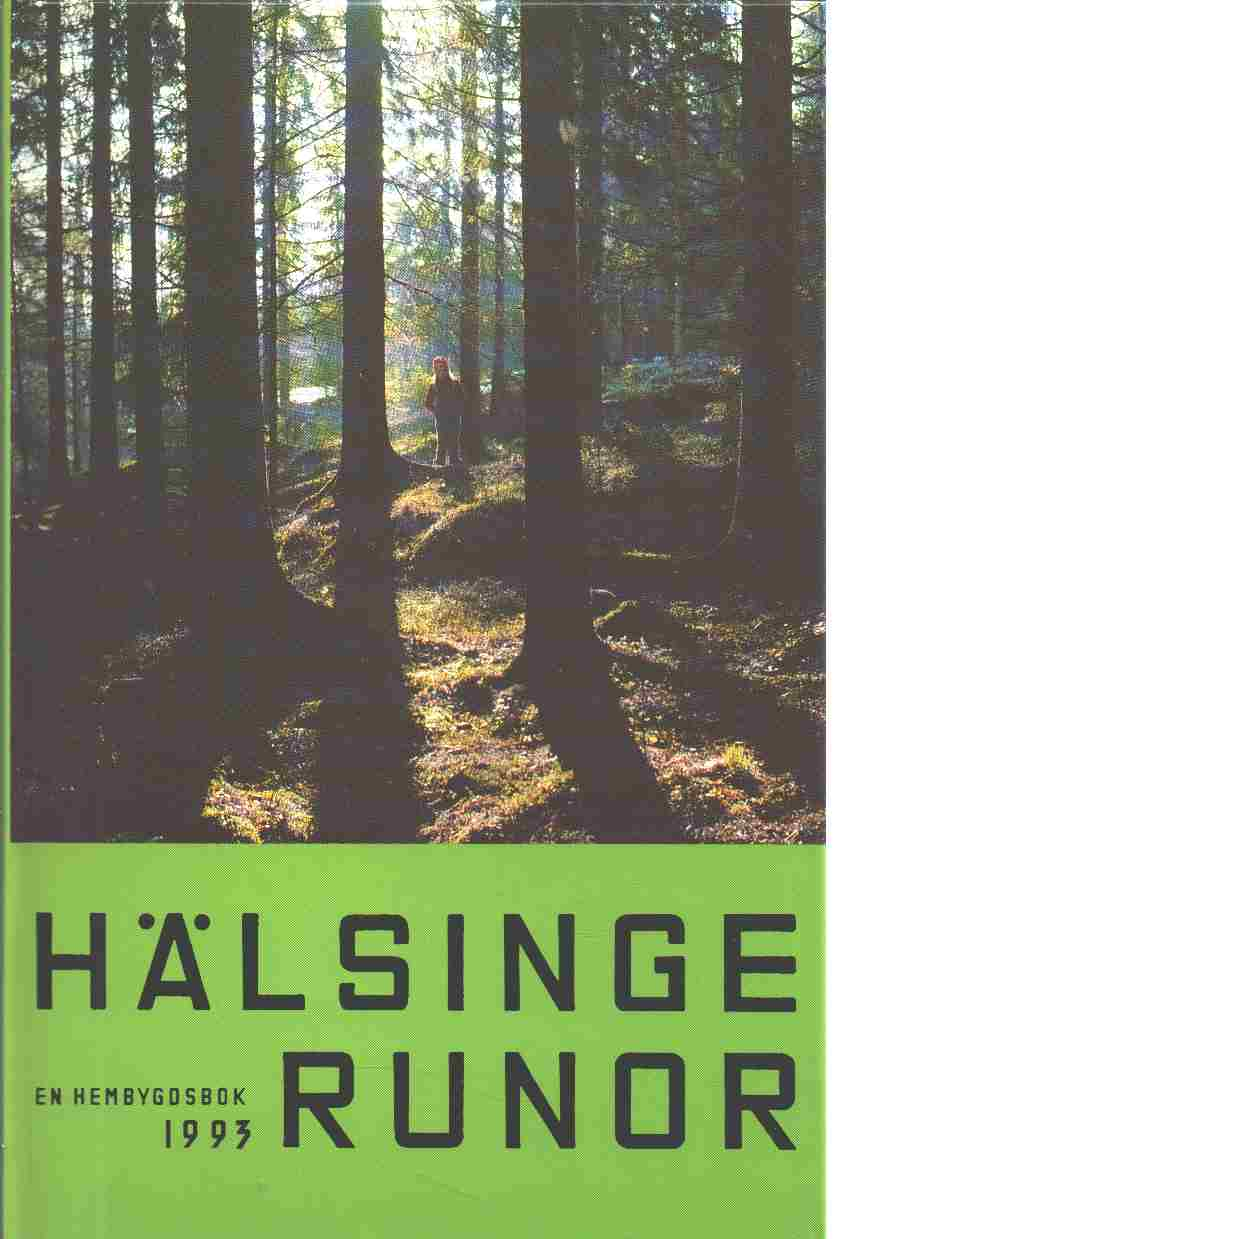 Hälsingerunor 1993 - Red.